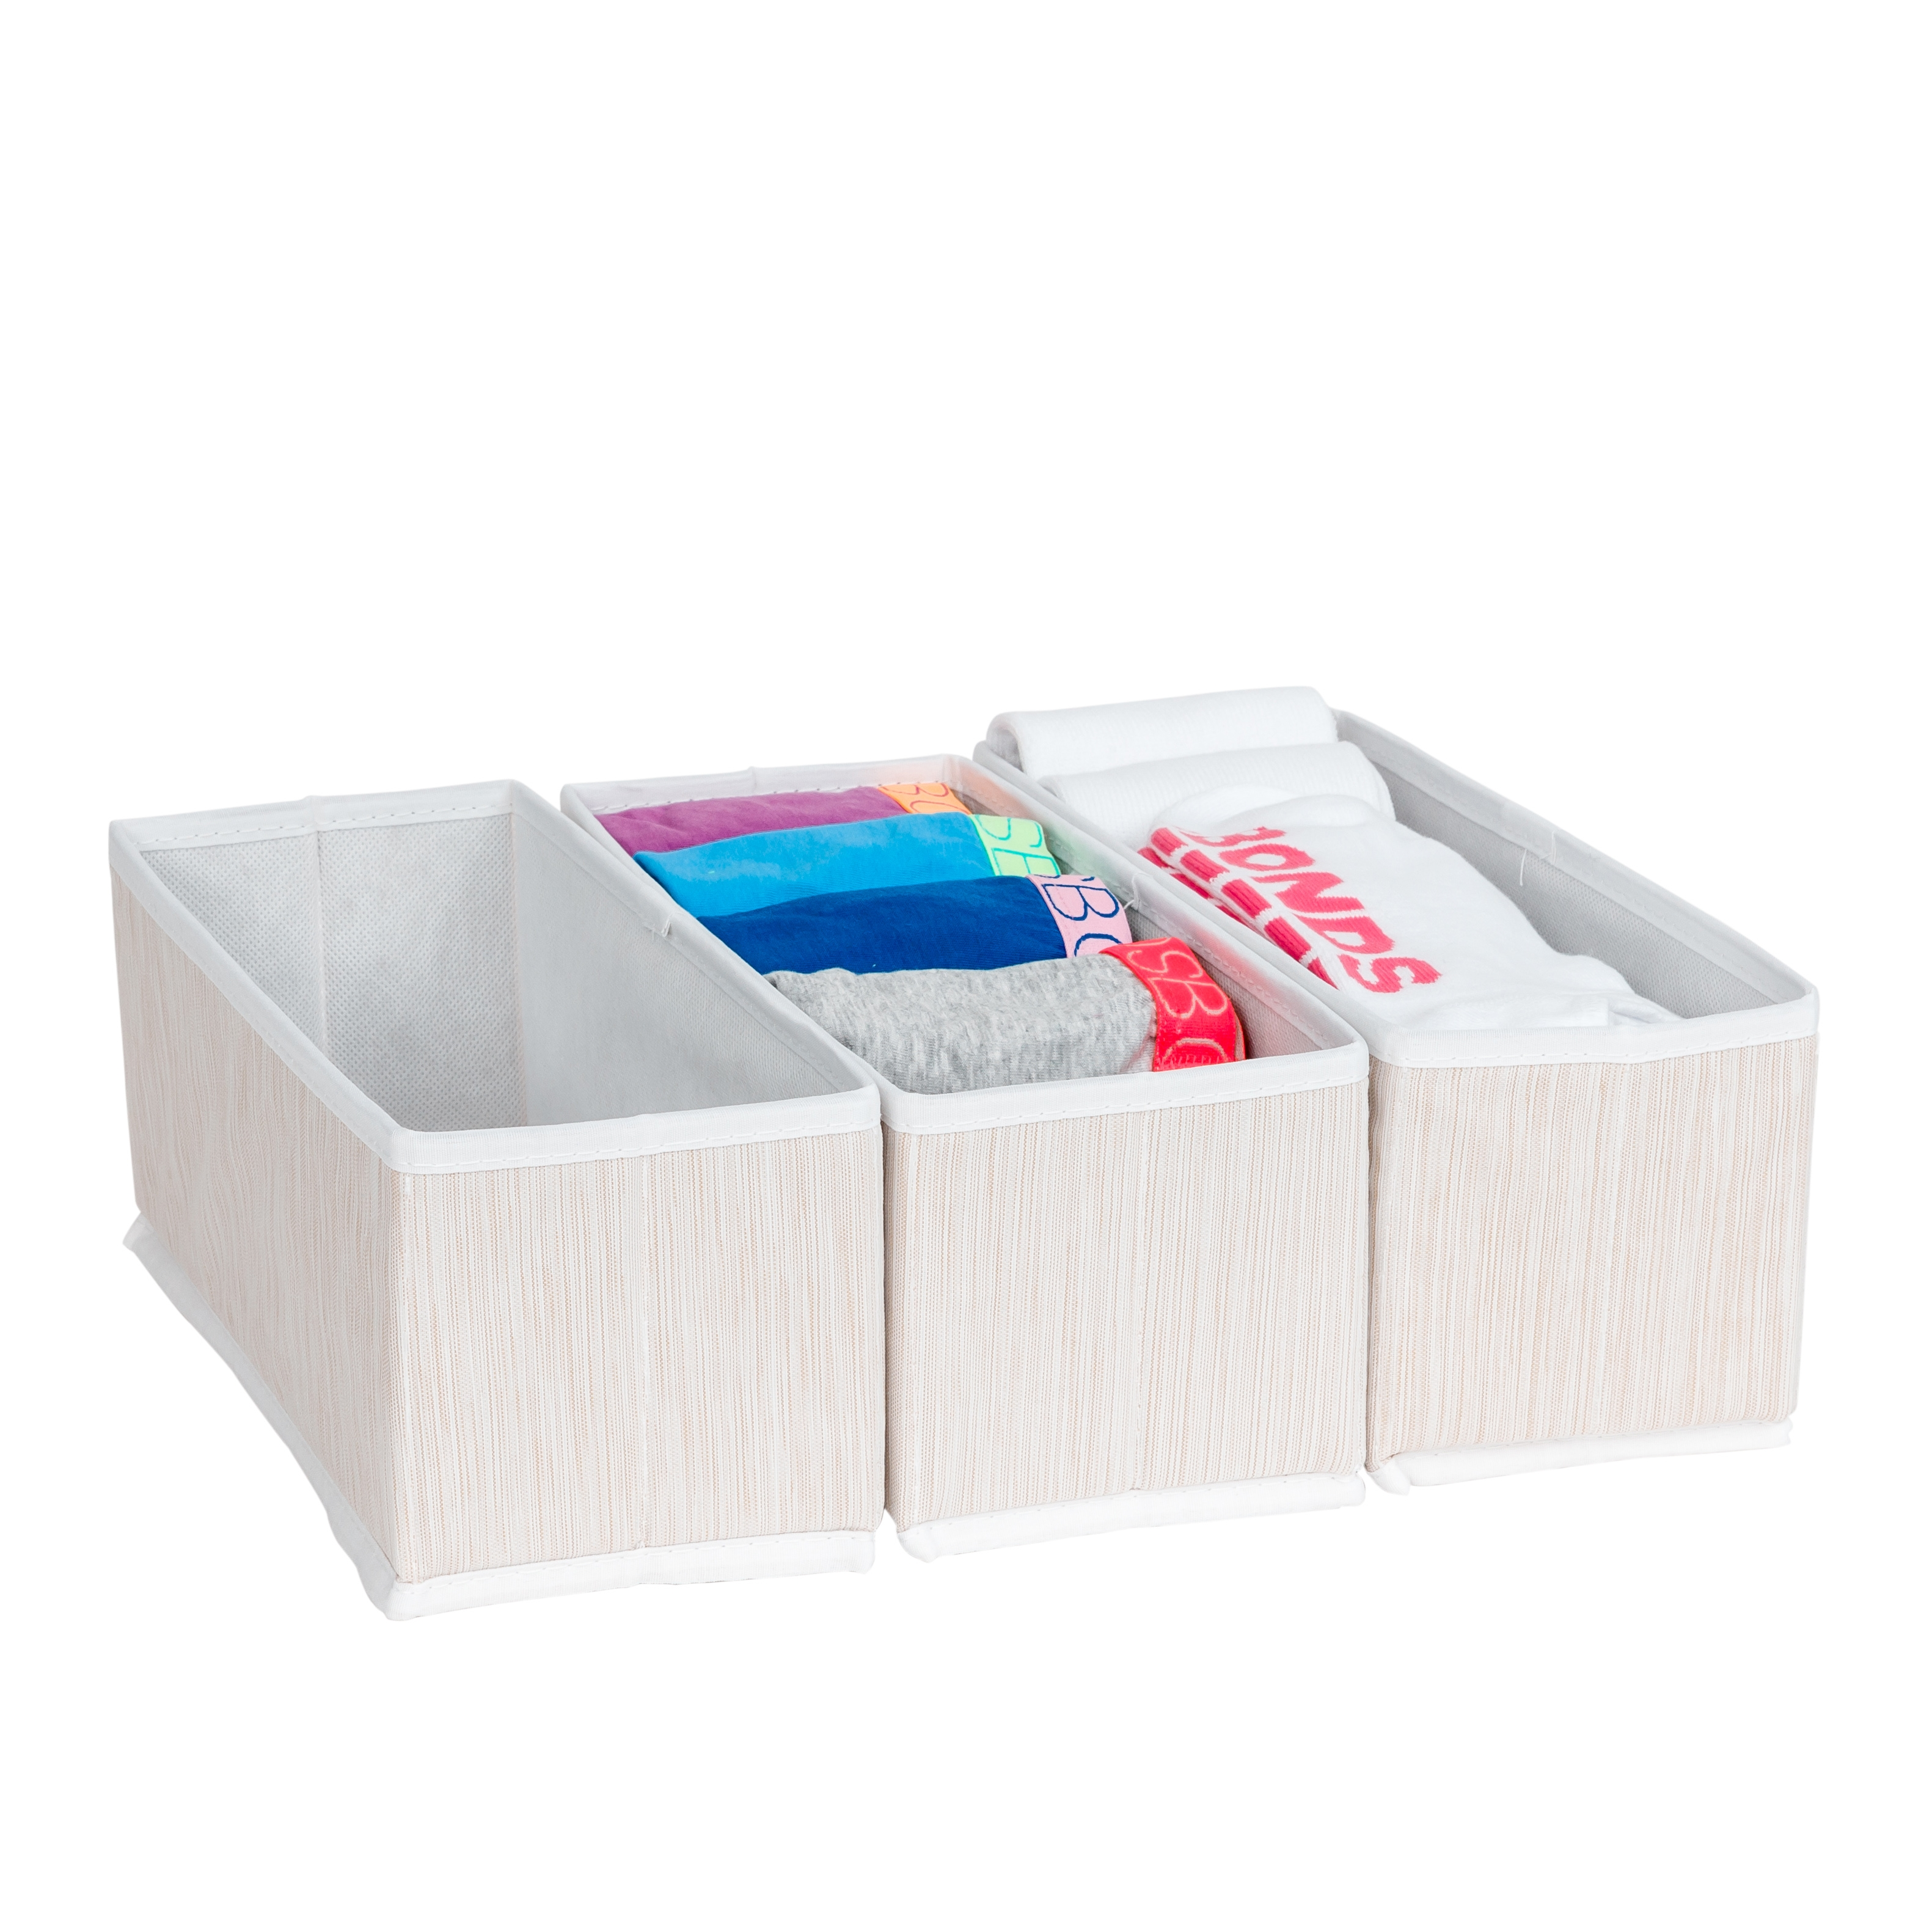 Fabric Drawer Organiser Set 3 From Storage Box